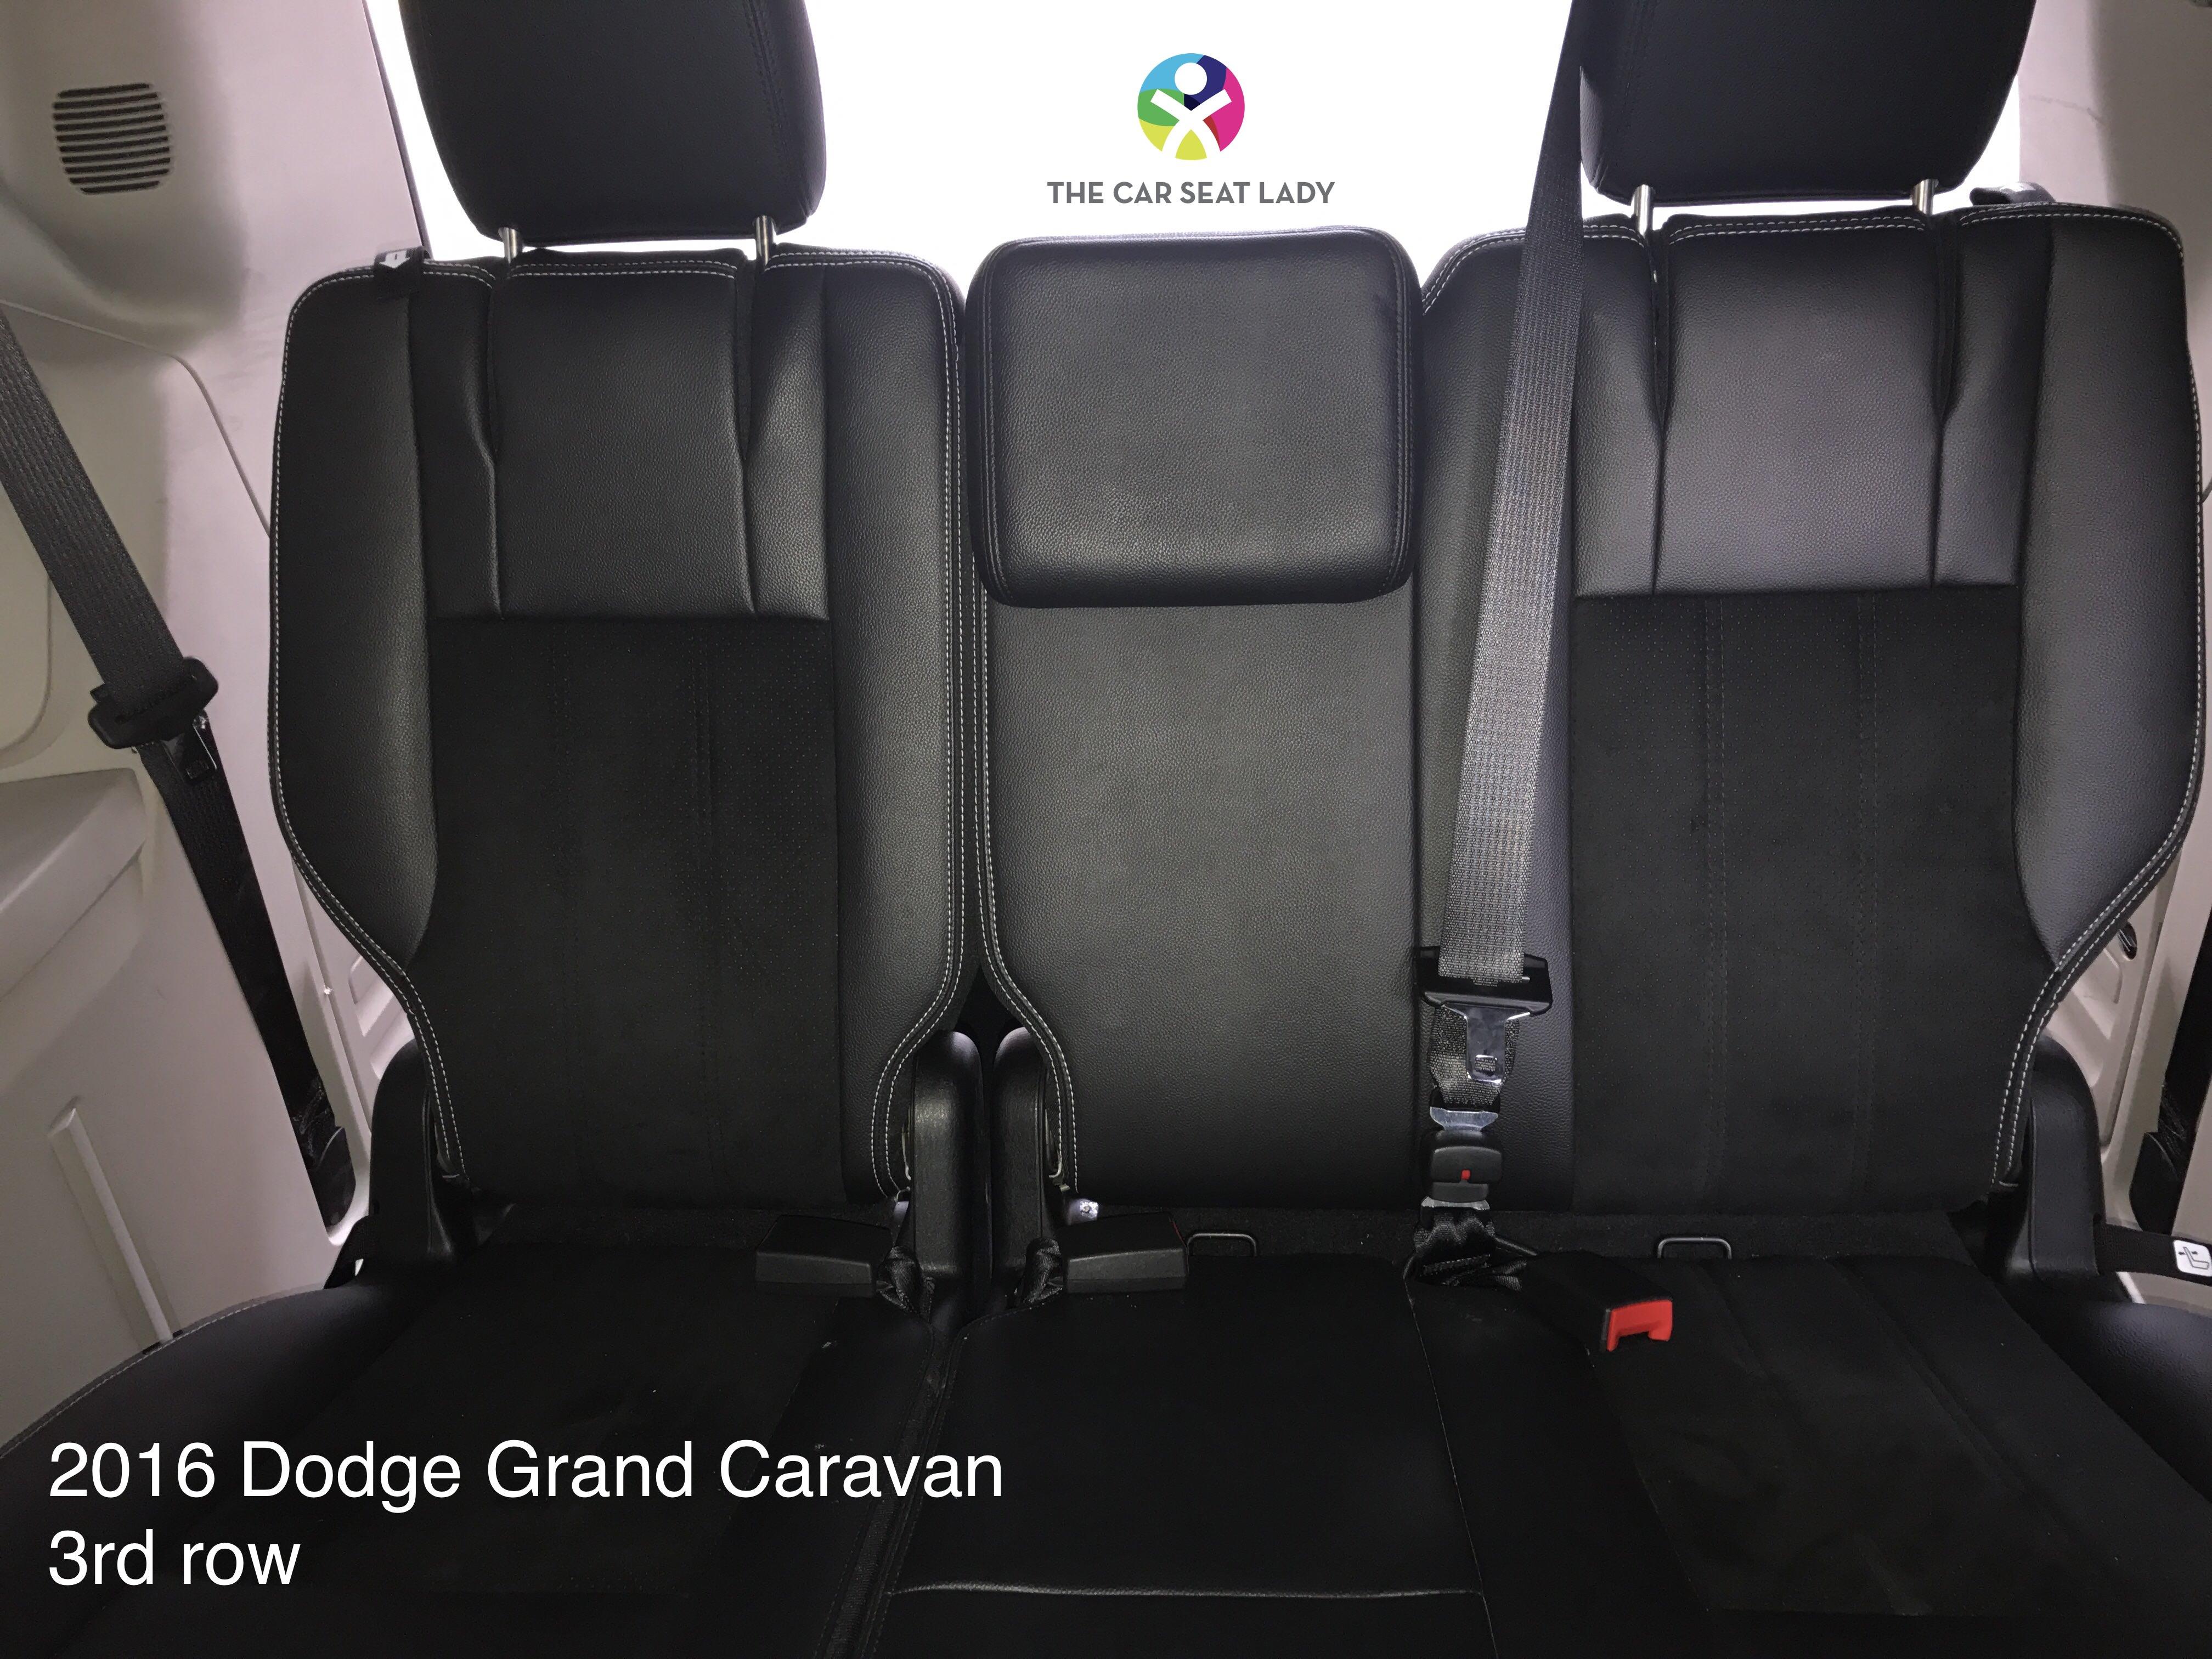 The Car Seat Lady Dodge Grand Caravan